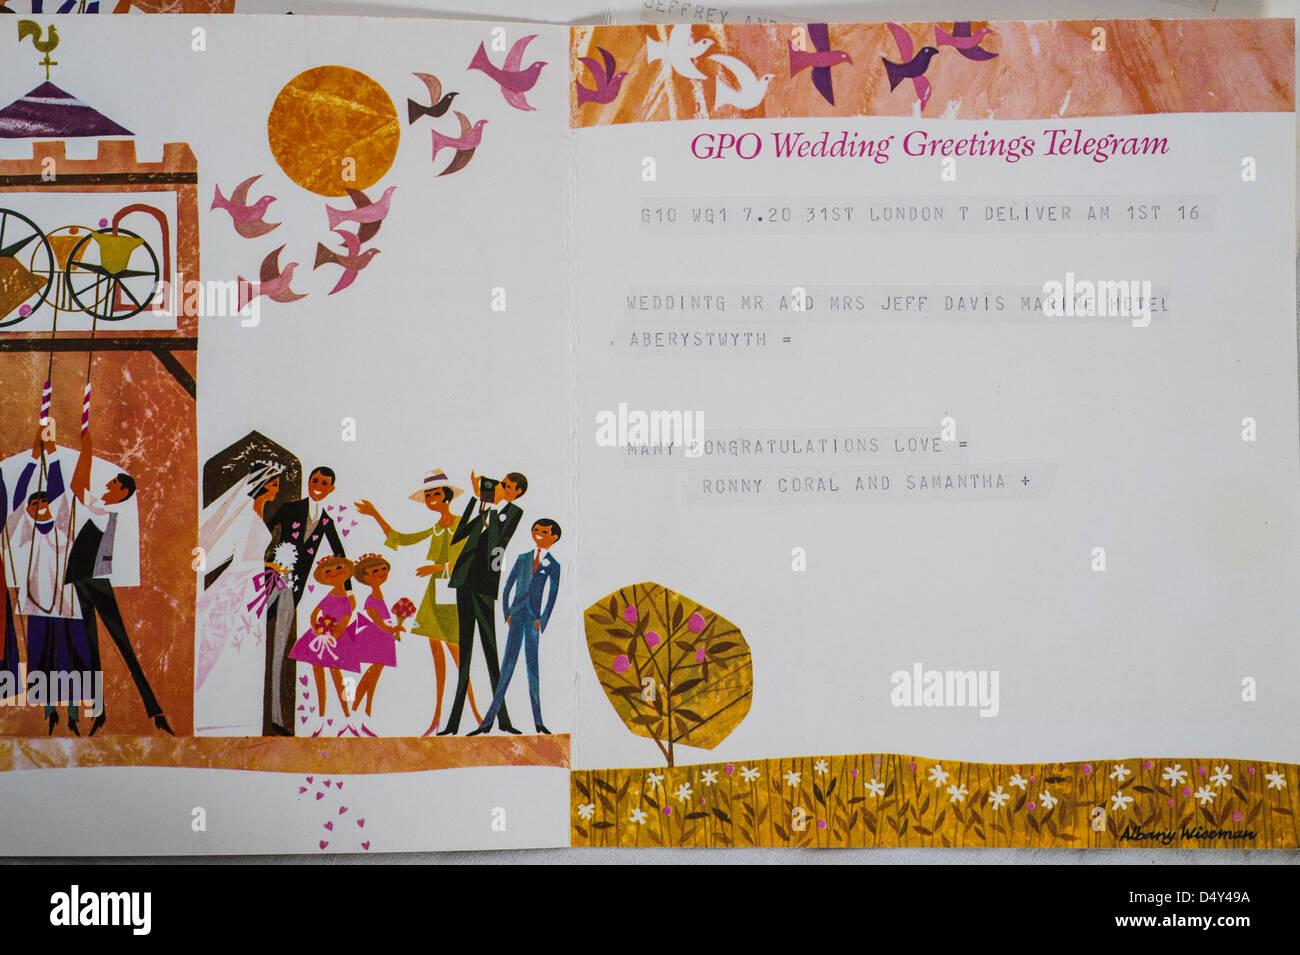 a 1950's GPO Wedding Greetings congratulations telegram UK - Stock Image